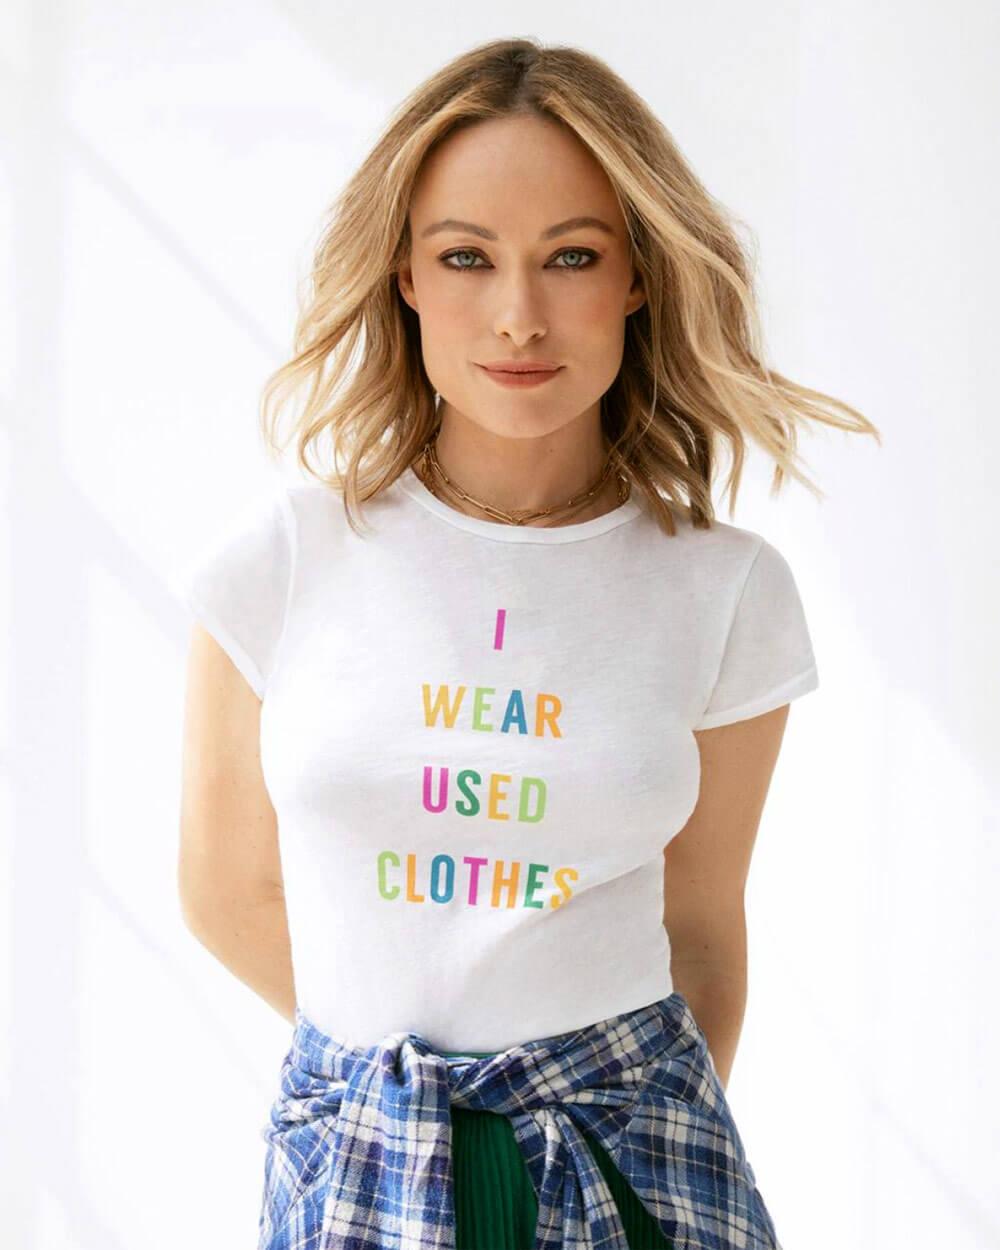 Olivia Wilde Slow Fashion Celebrity